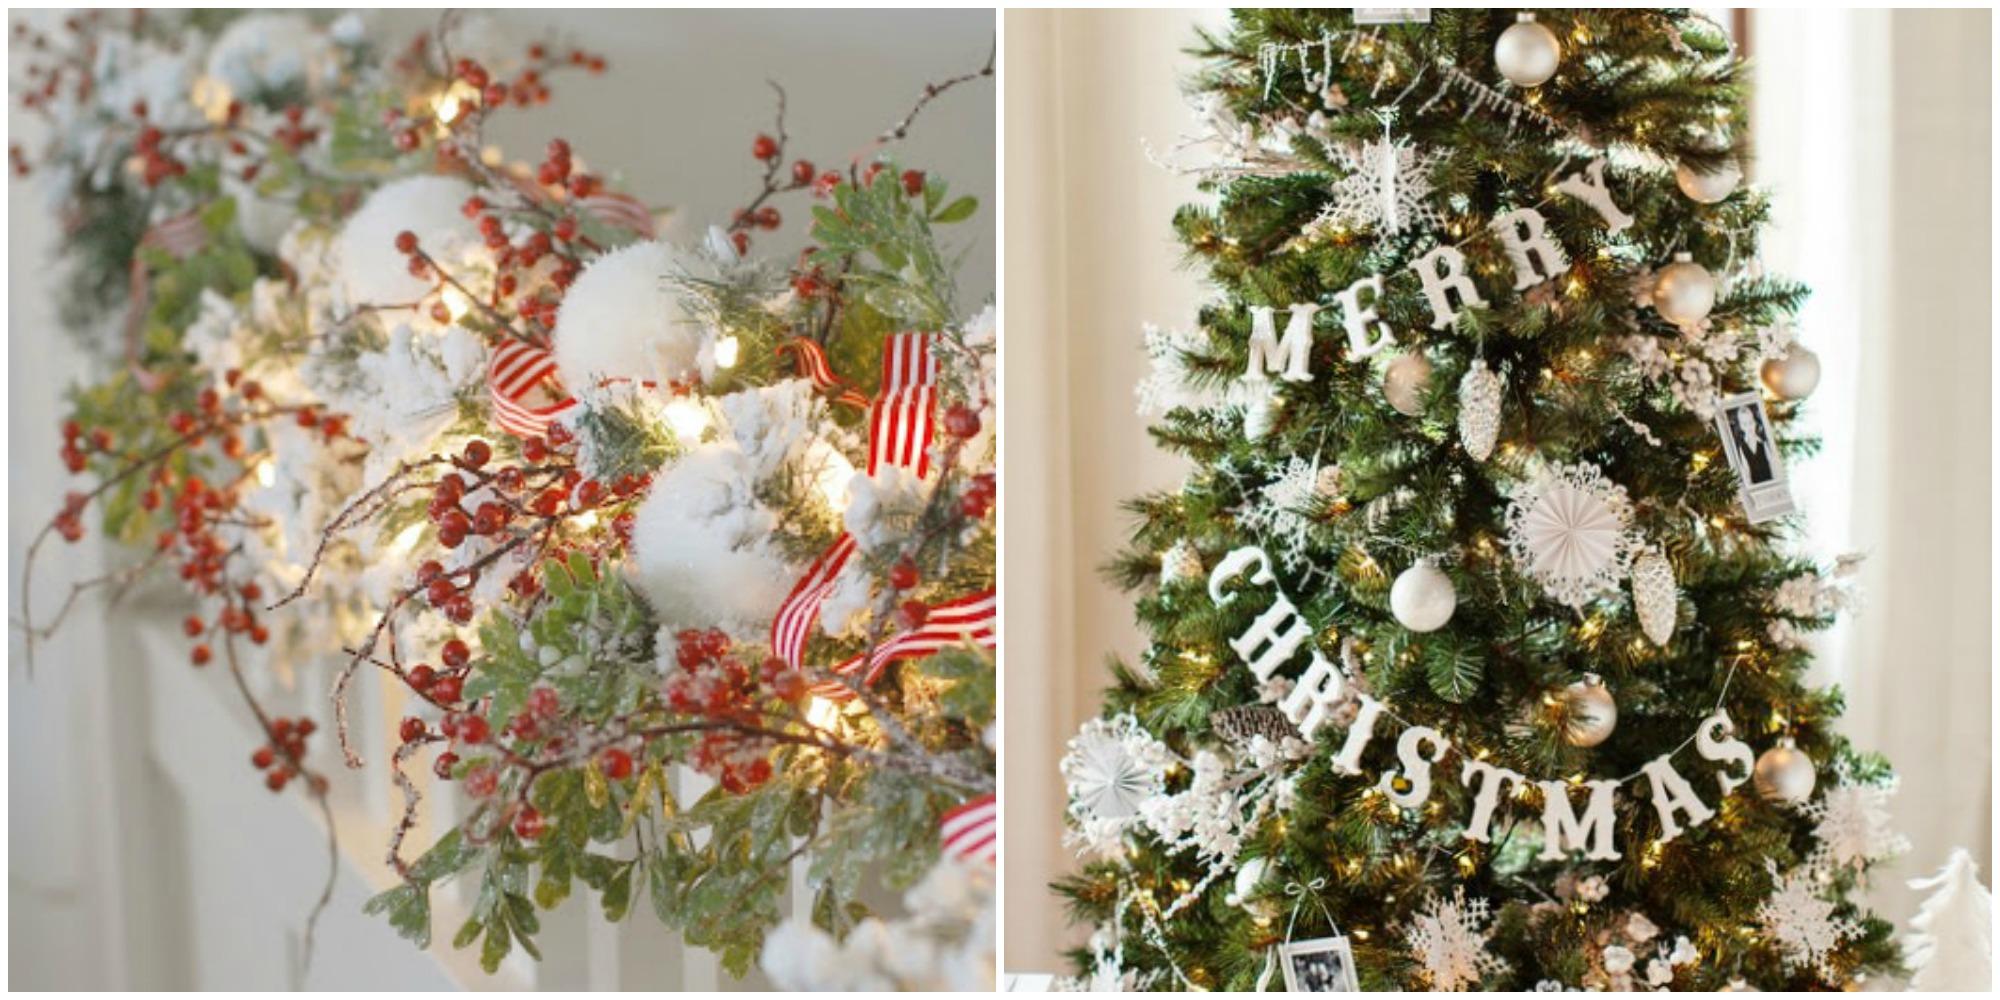 27 Christmas Garland Ideas